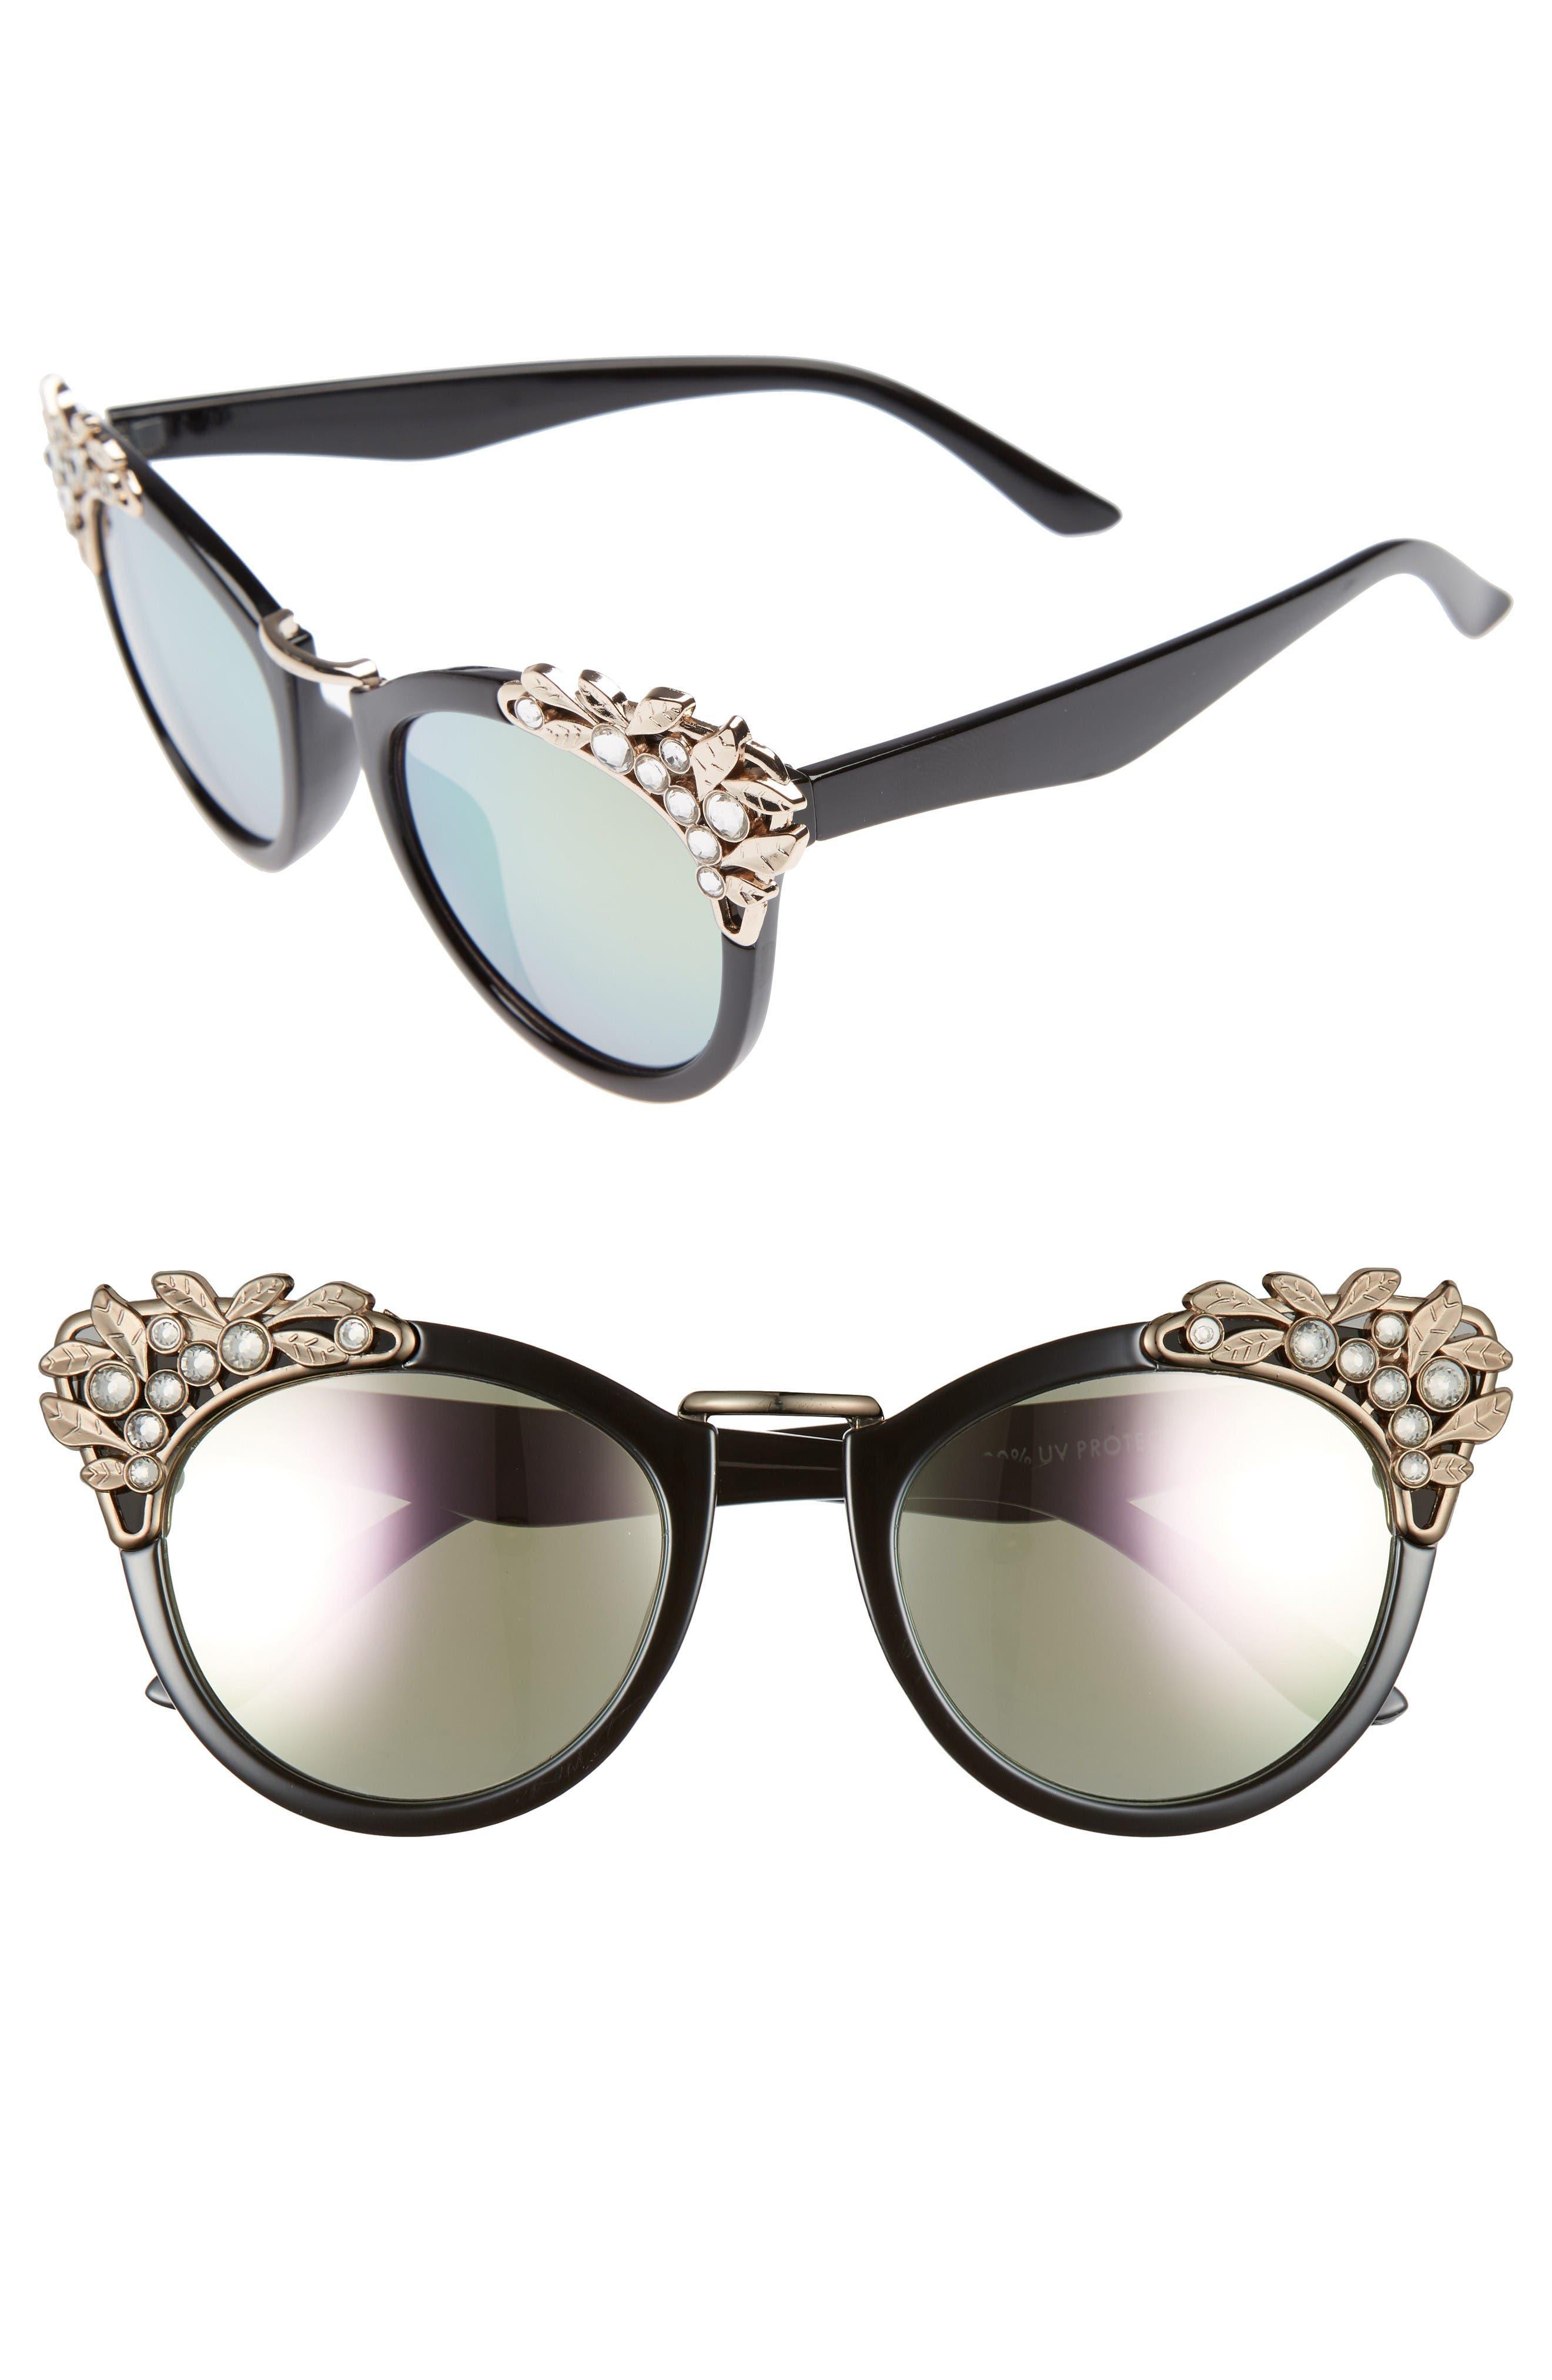 Alternate Image 1 Selected - BP. Optical Illusion 56mm Embellished Cat Eye Sunglasses